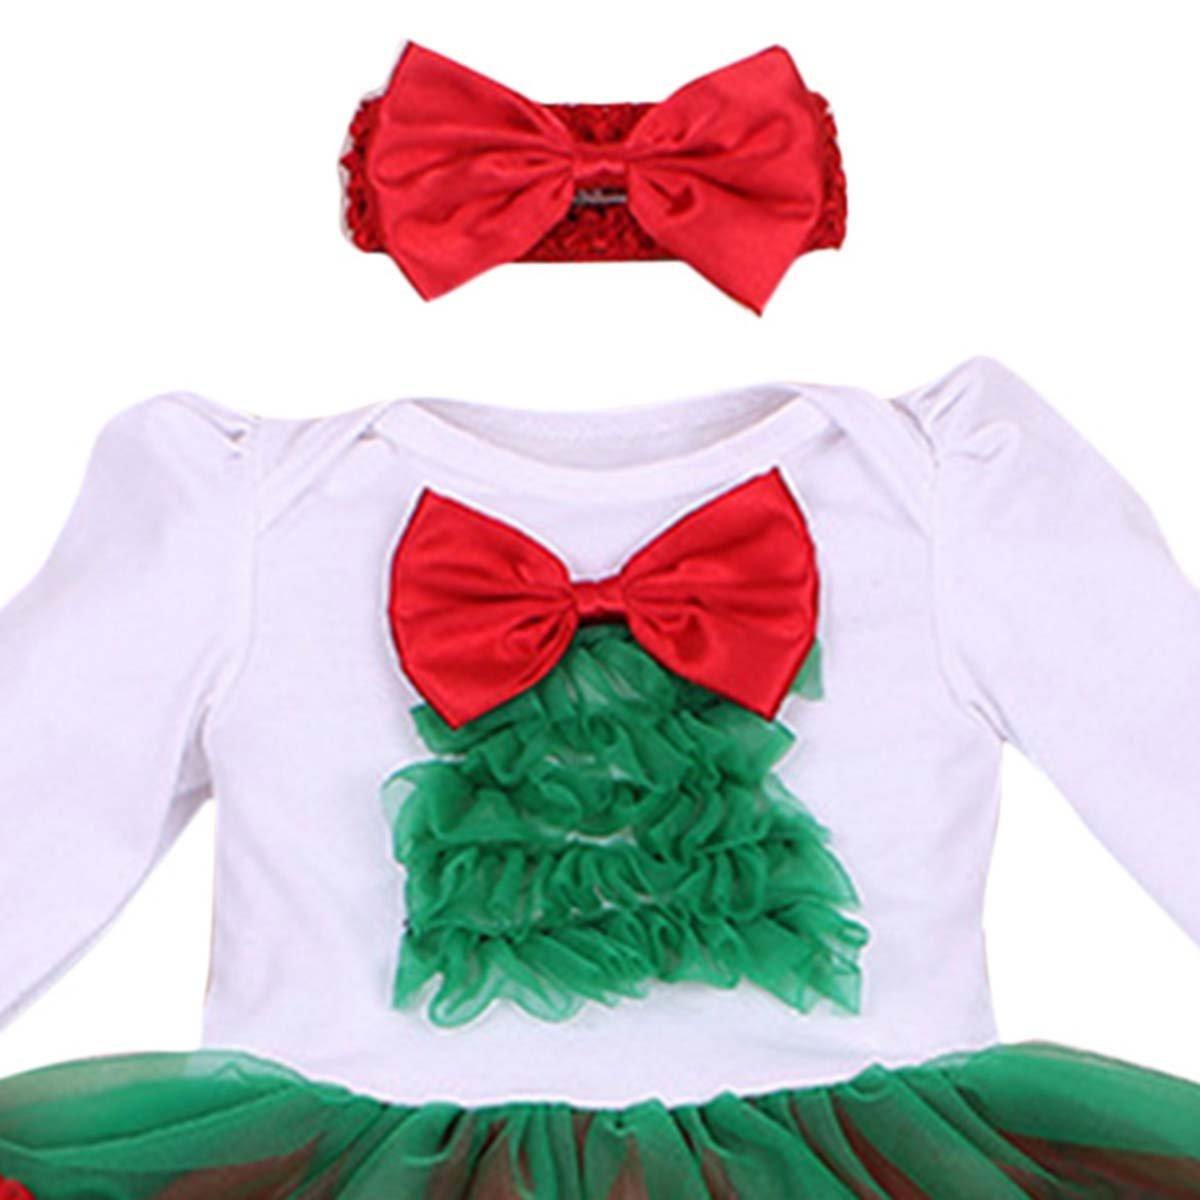 4pcs Baby Girls Christamas Tutu Dress Headband Baby Shoes Cotton Outfit Sets M